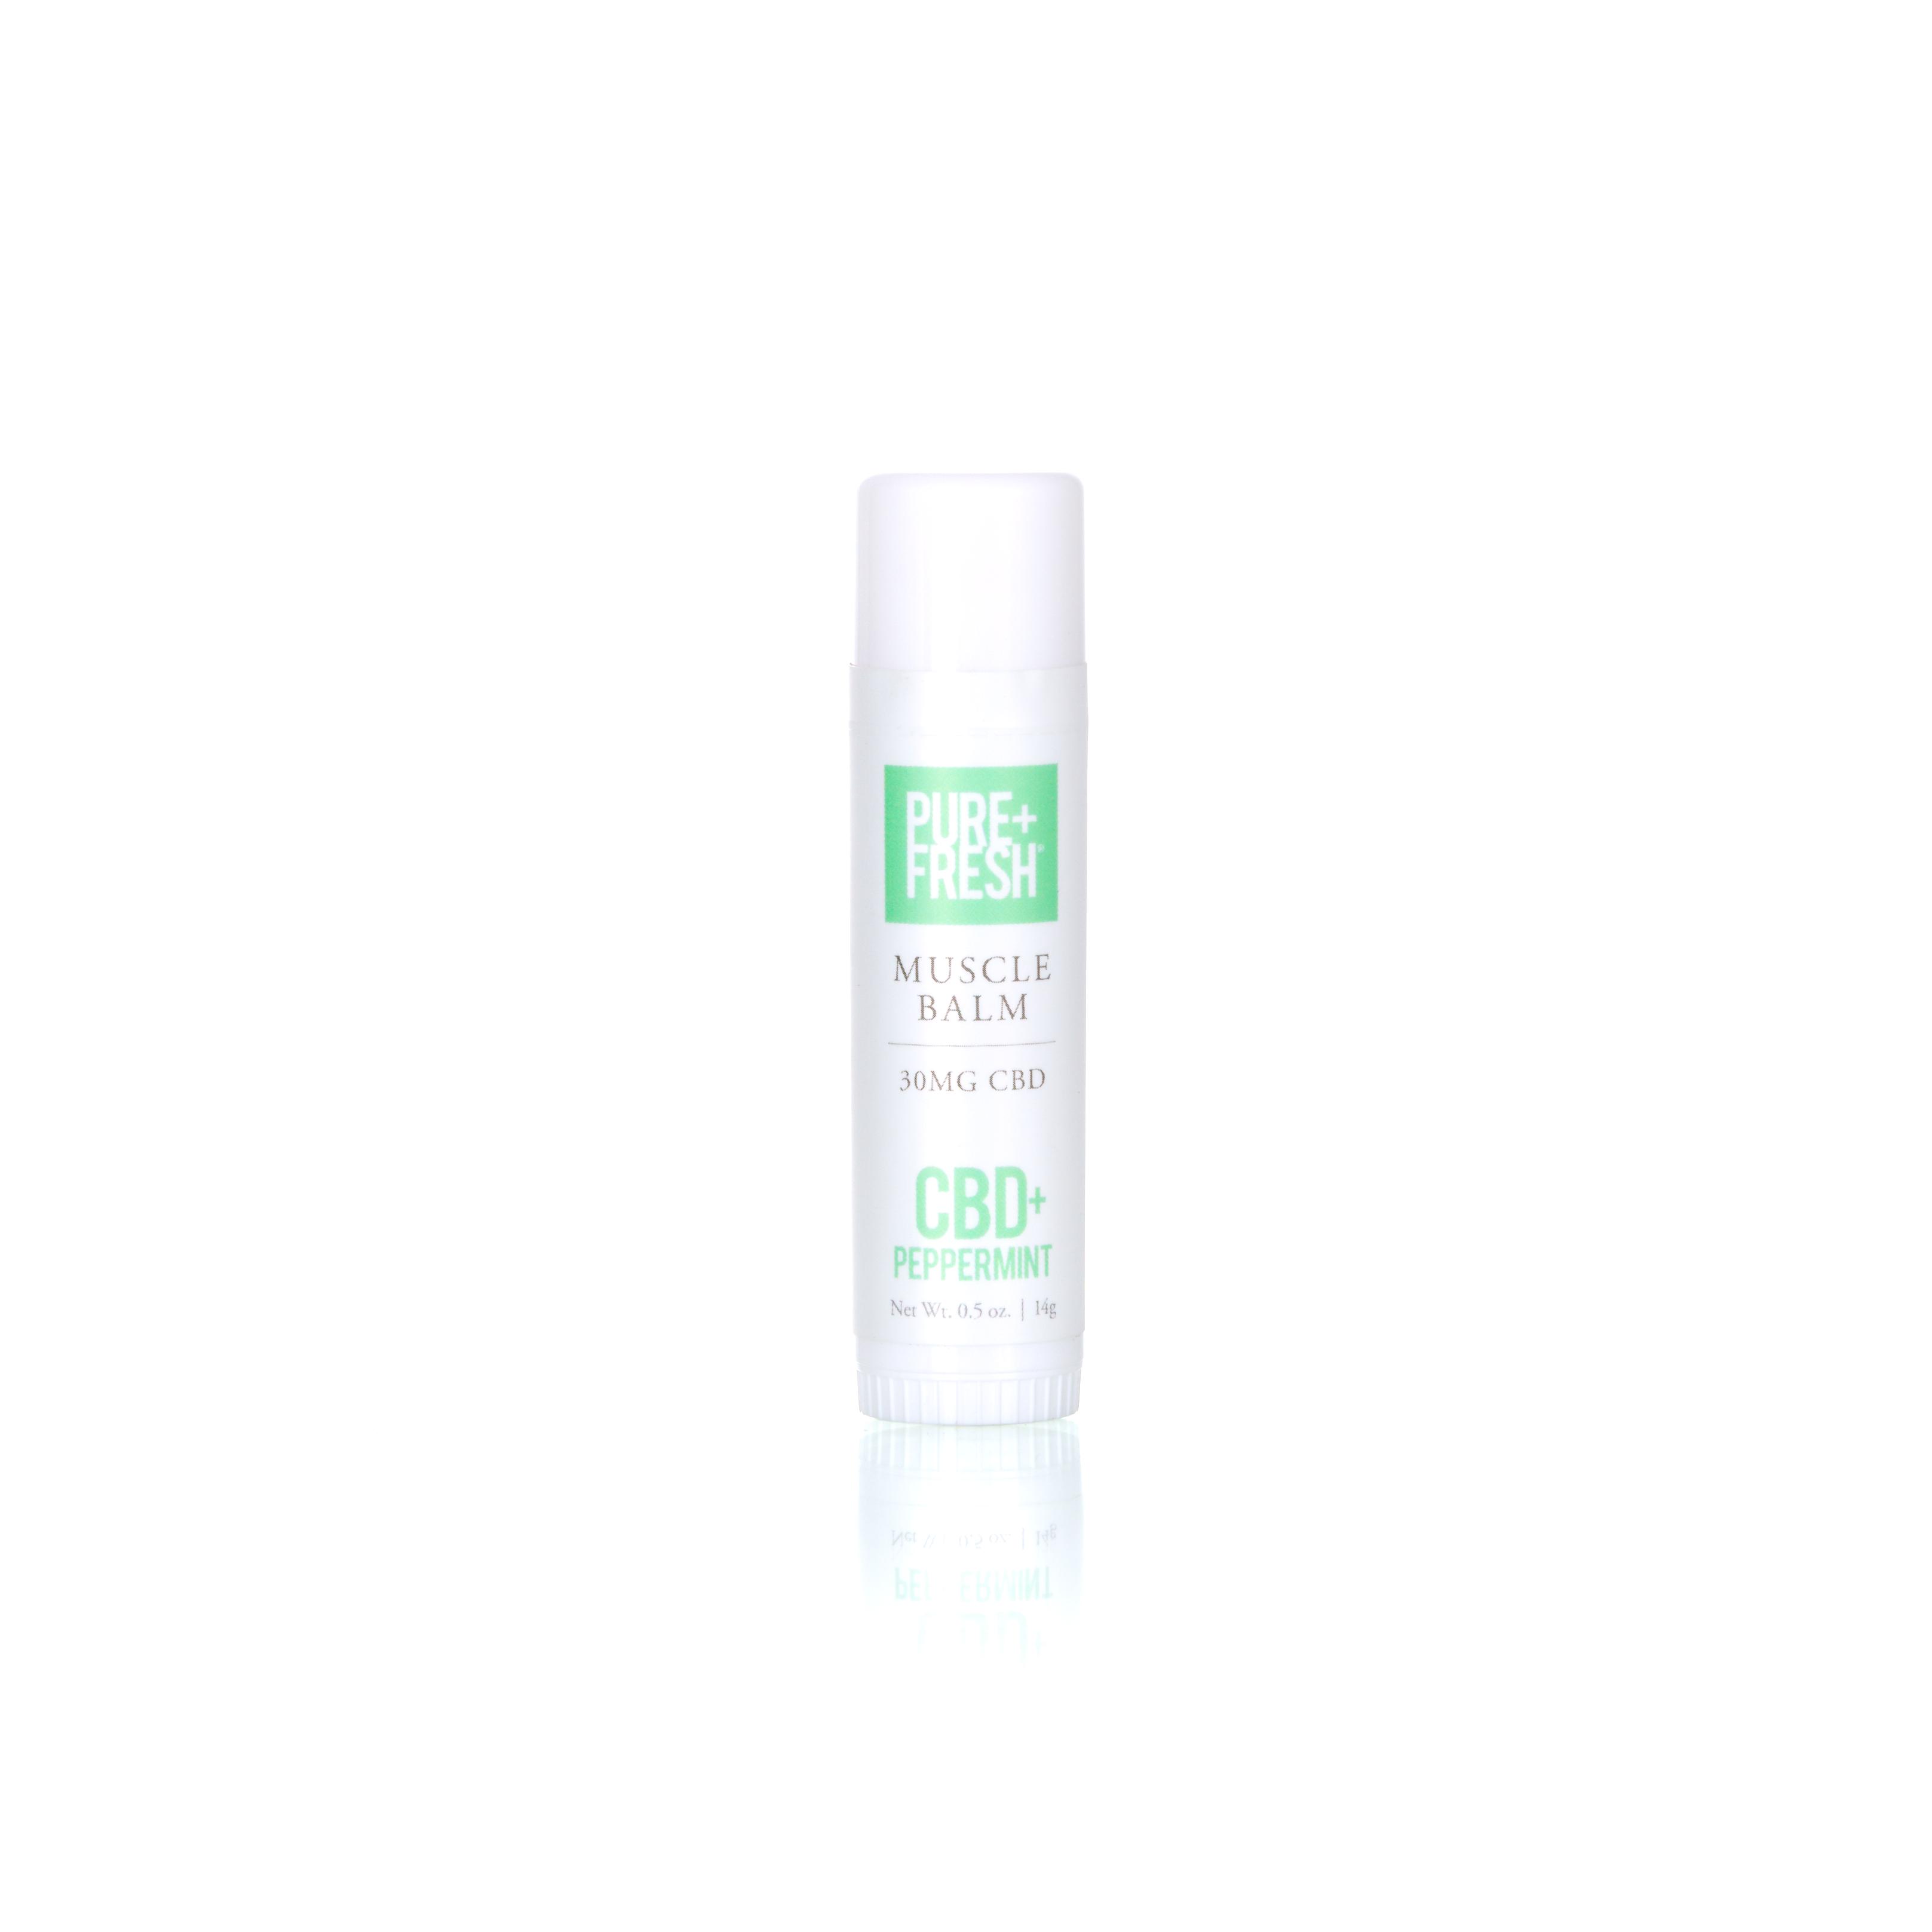 Bottle of Pure+Fresh CBD Peppermint CBD Balm